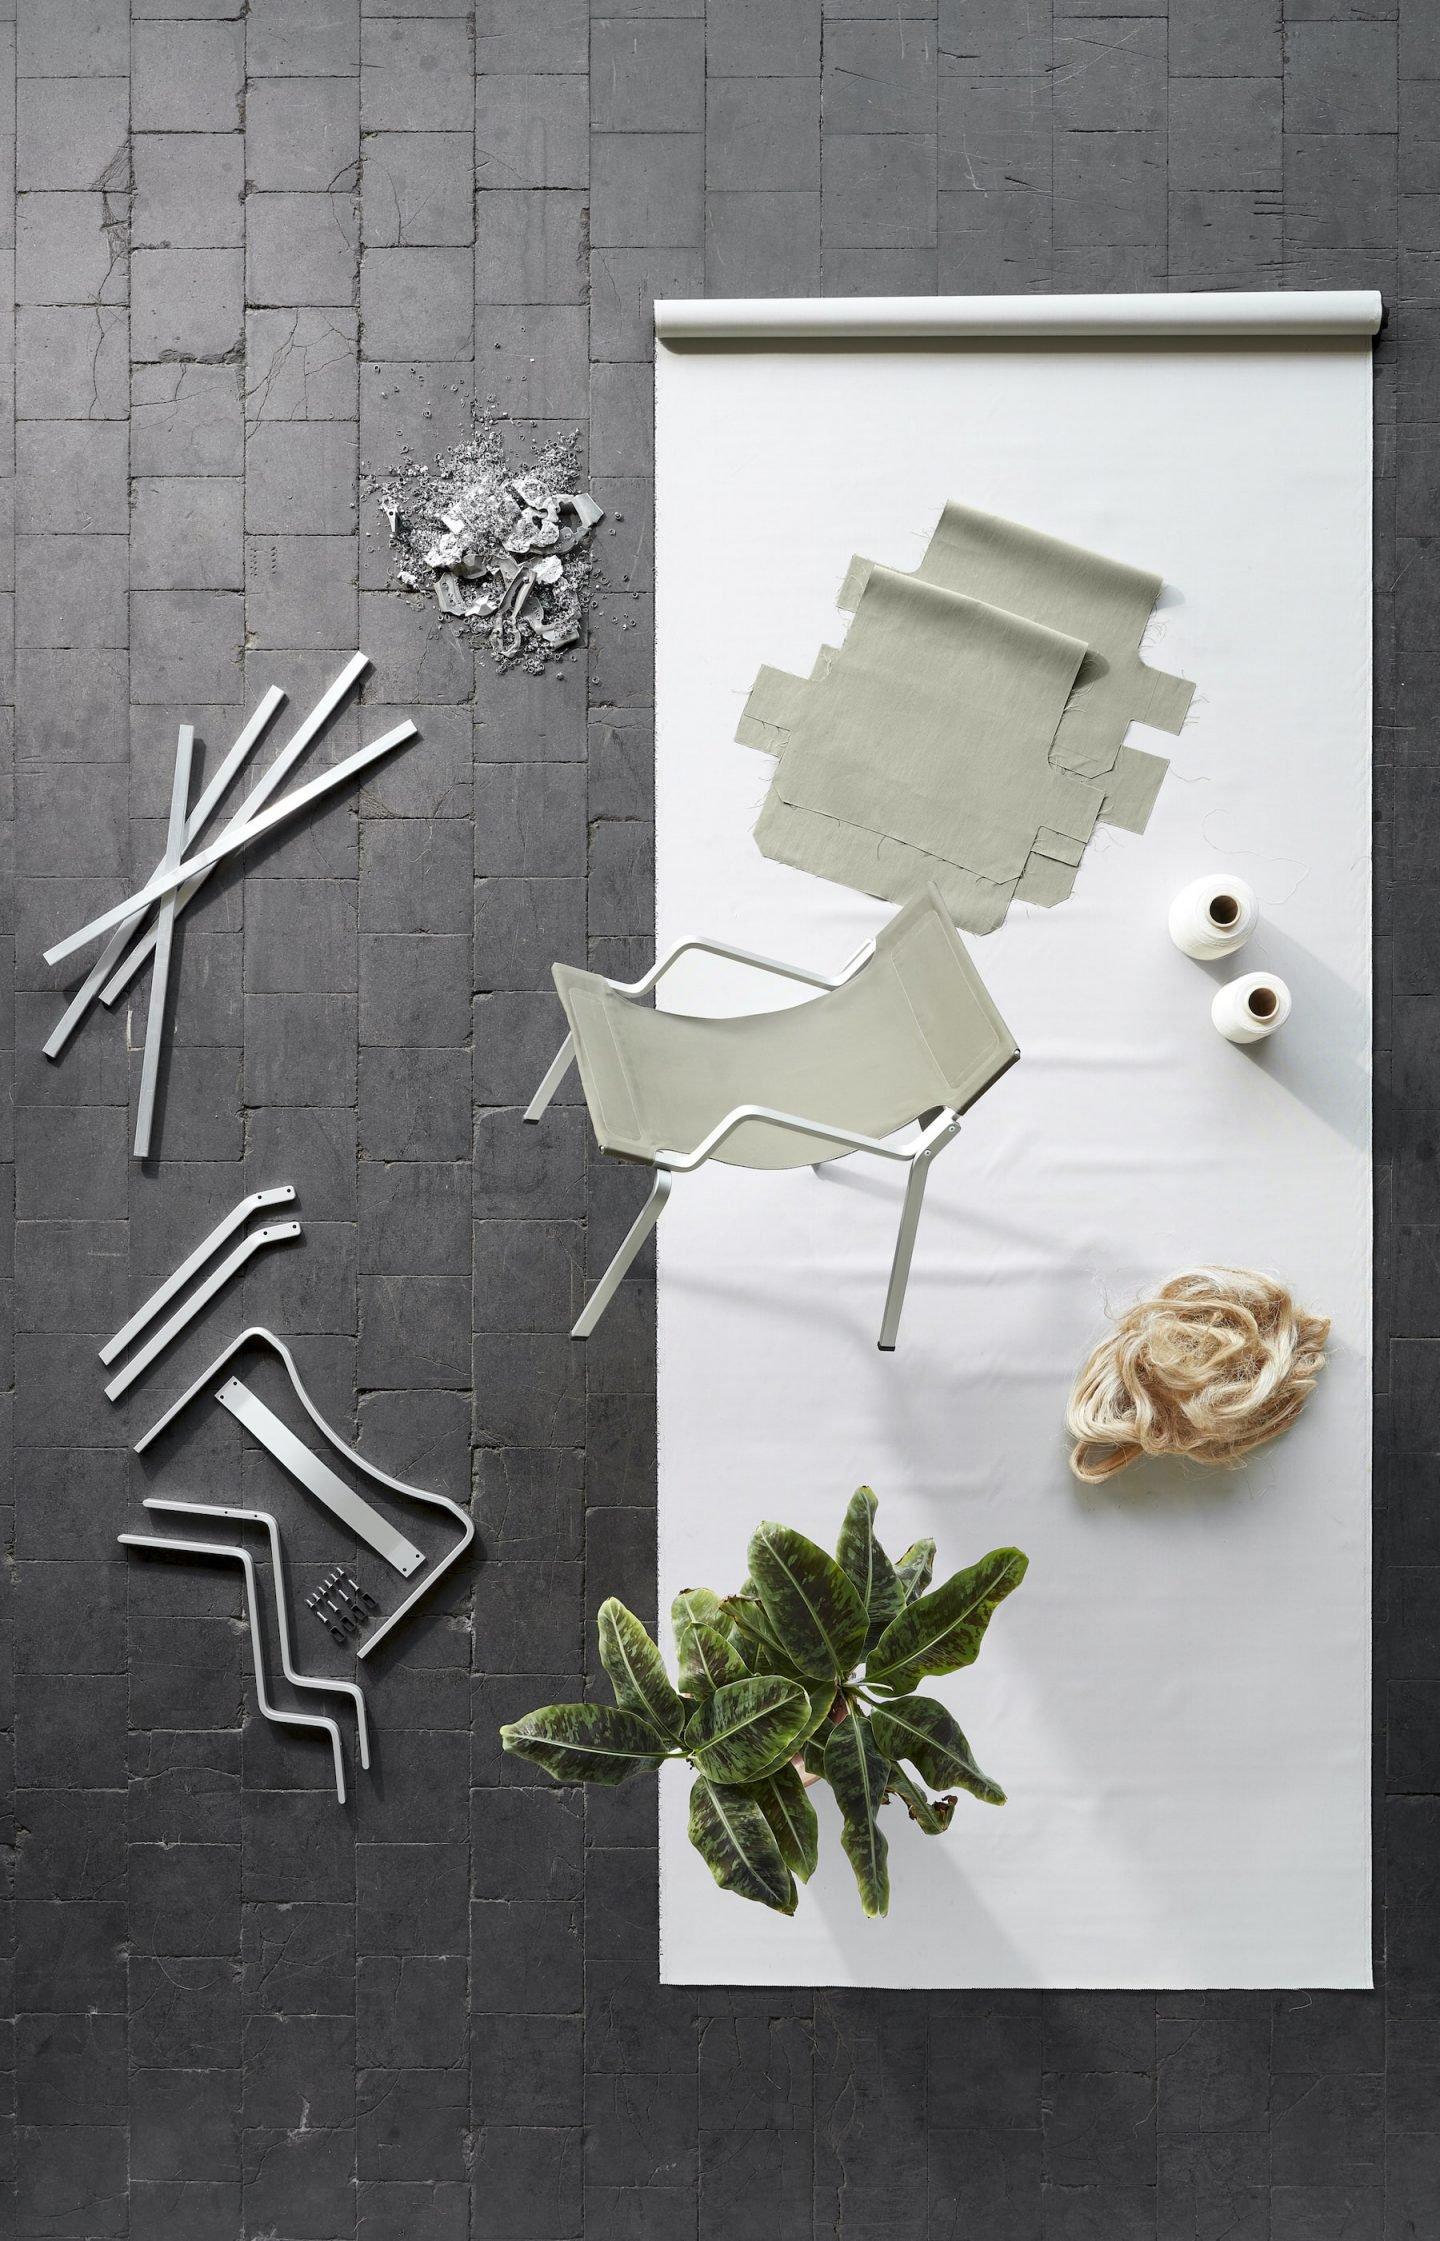 IGNANT-Design-Lehni-Enso-Chair-07-min